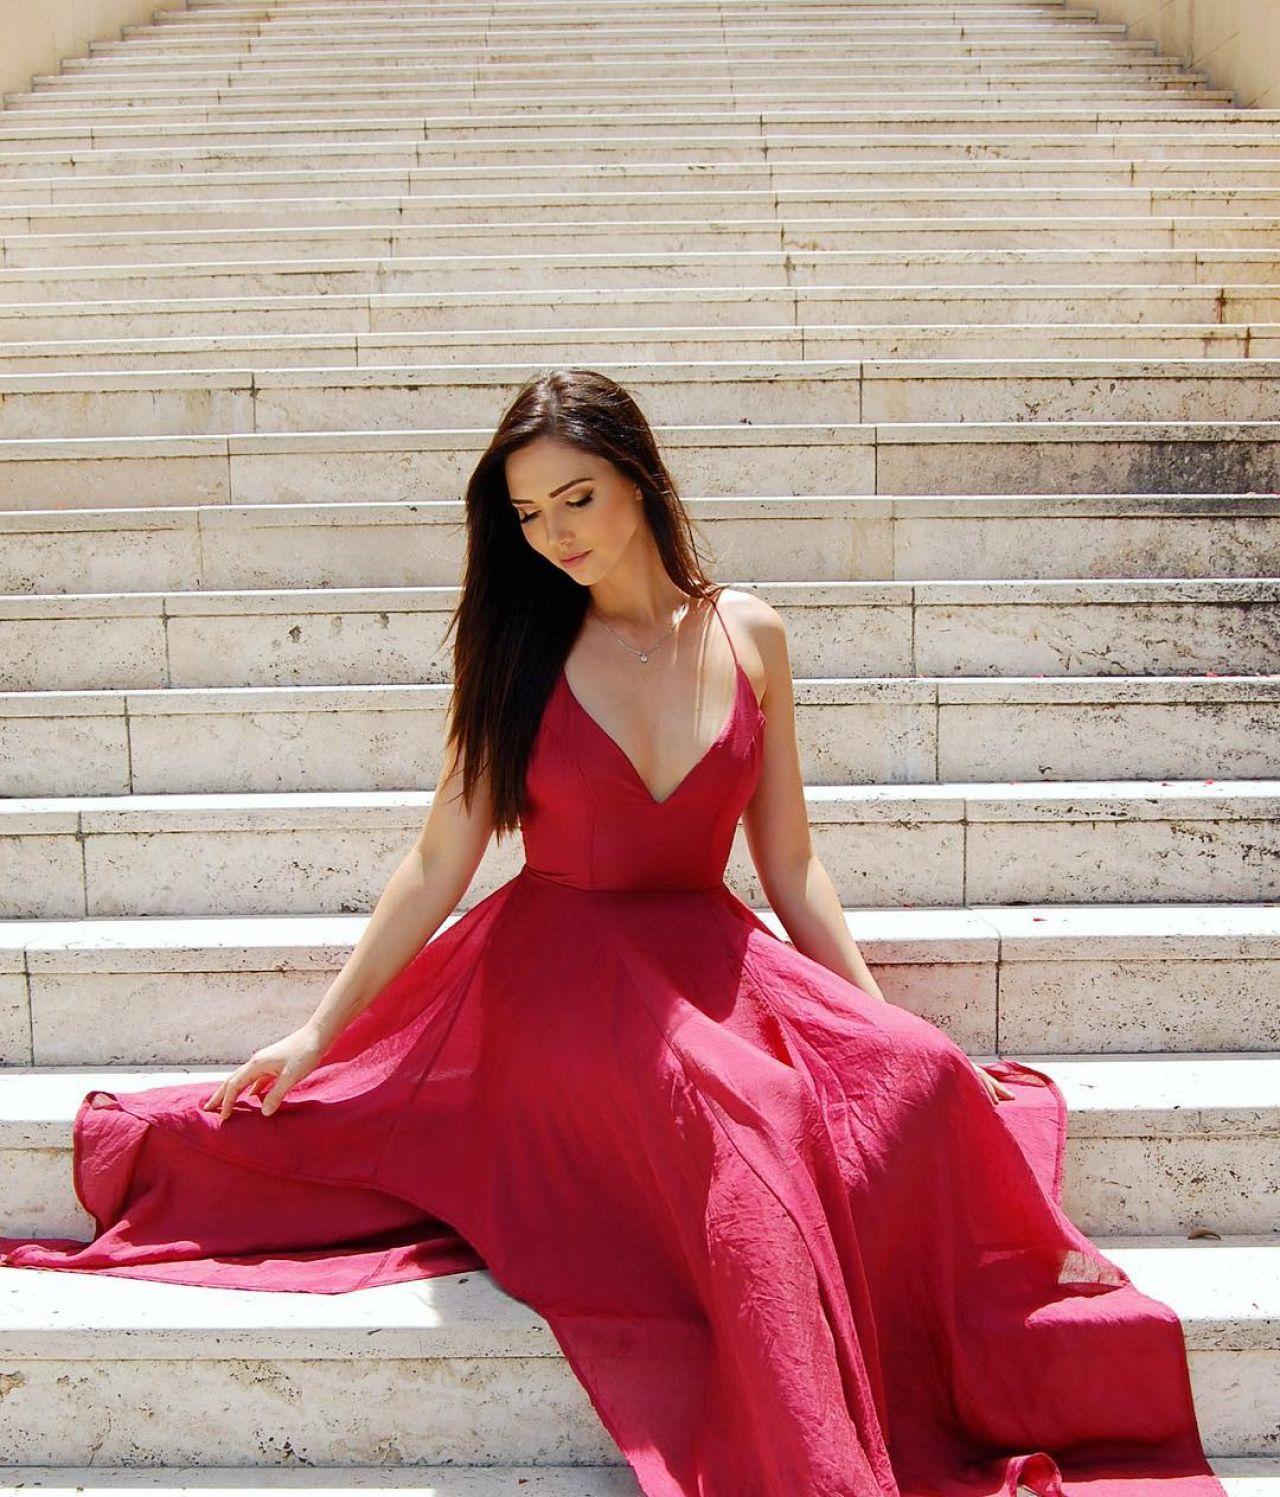 Jessica Green Photos